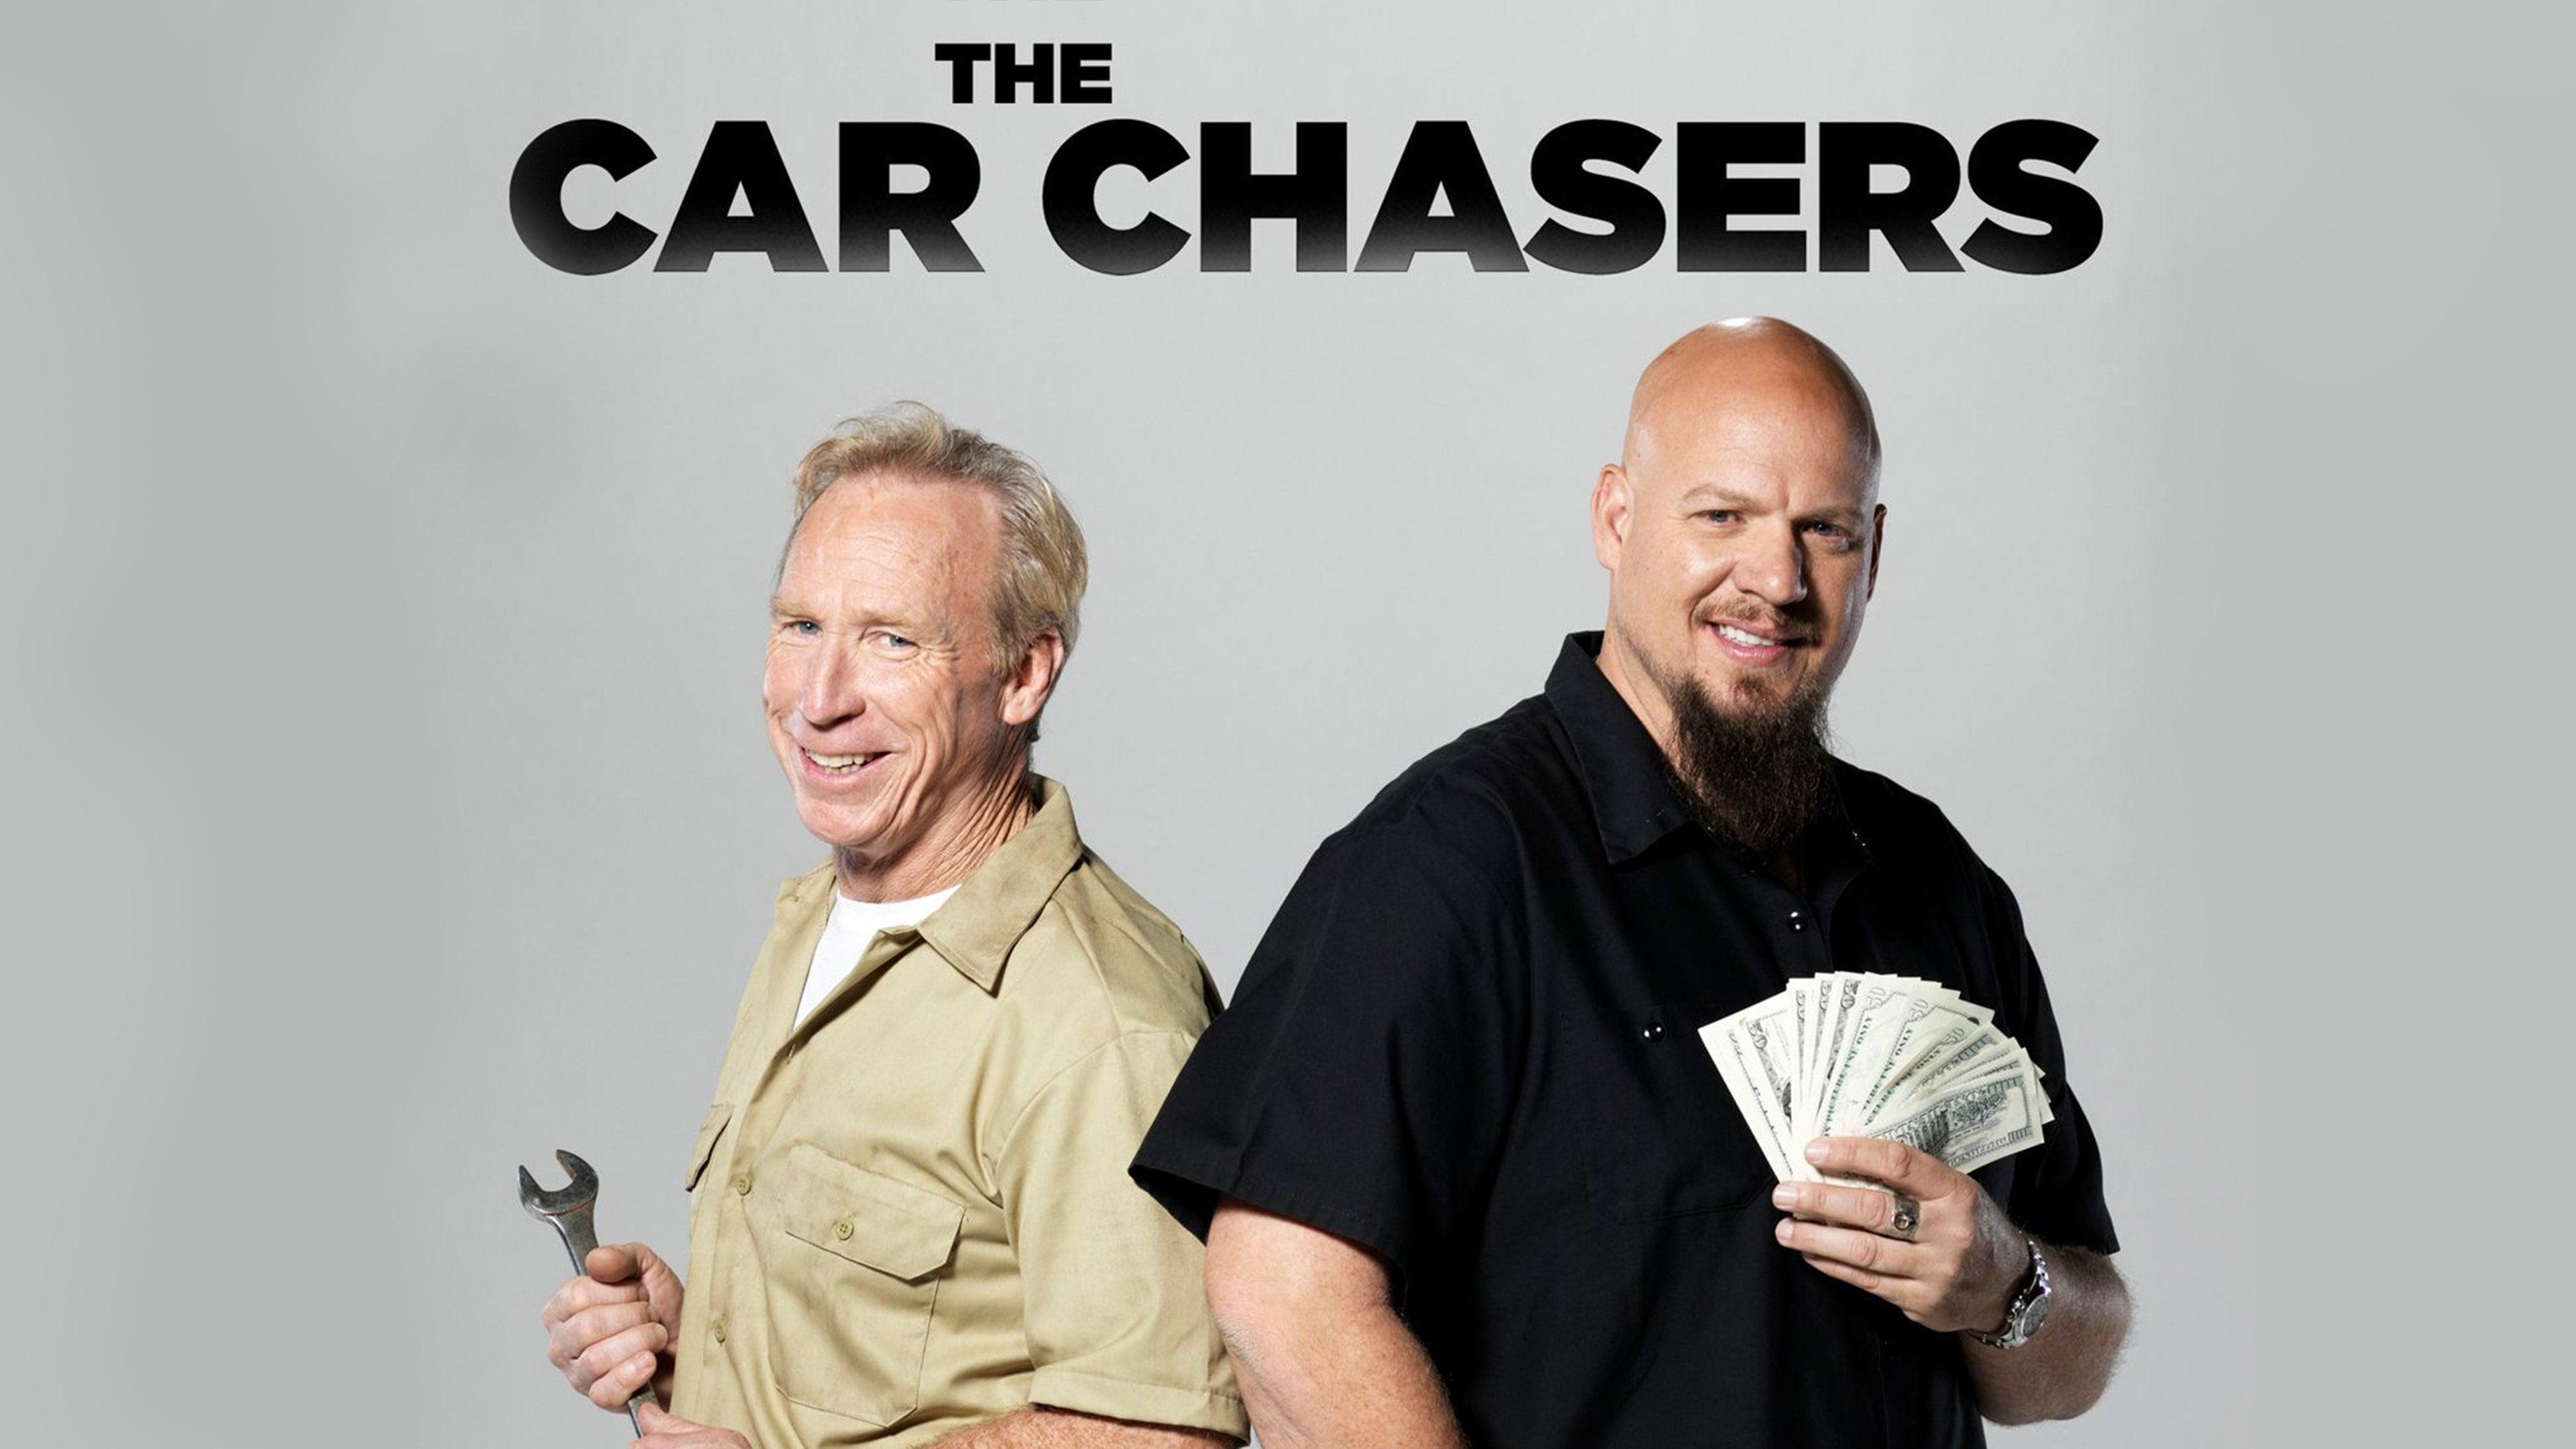 Three Great Cars - One Big Problem